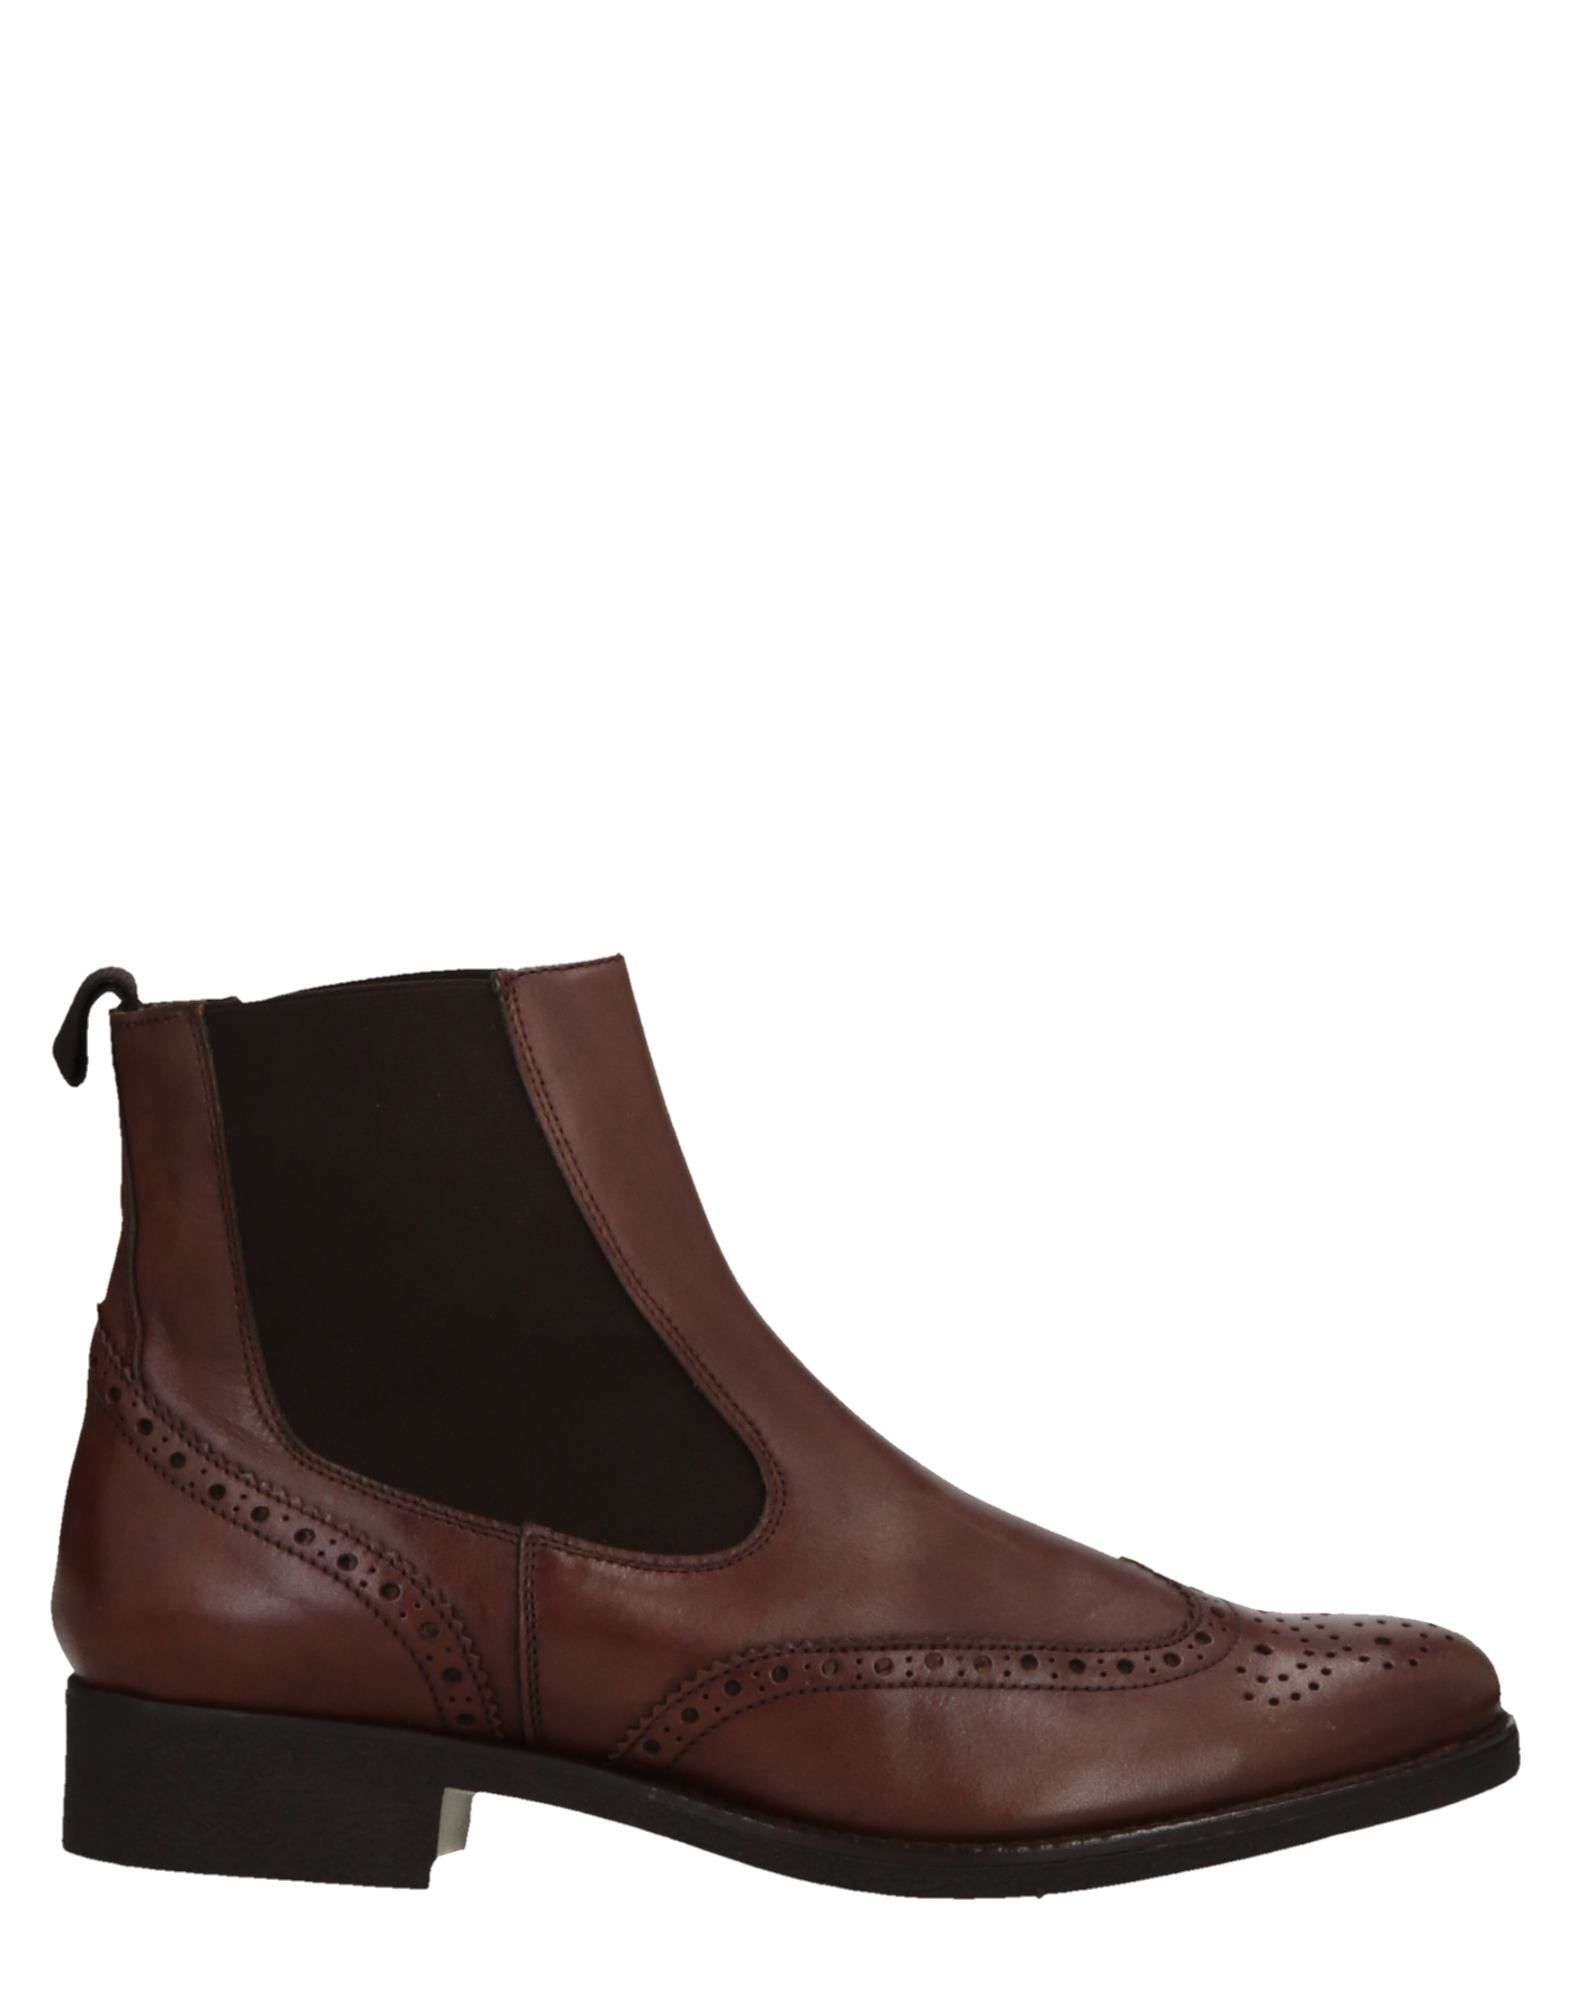 Anderson Chelsea Boots Boots Boots Damen  11516639BJ Gute Qualität beliebte Schuhe 2545e5